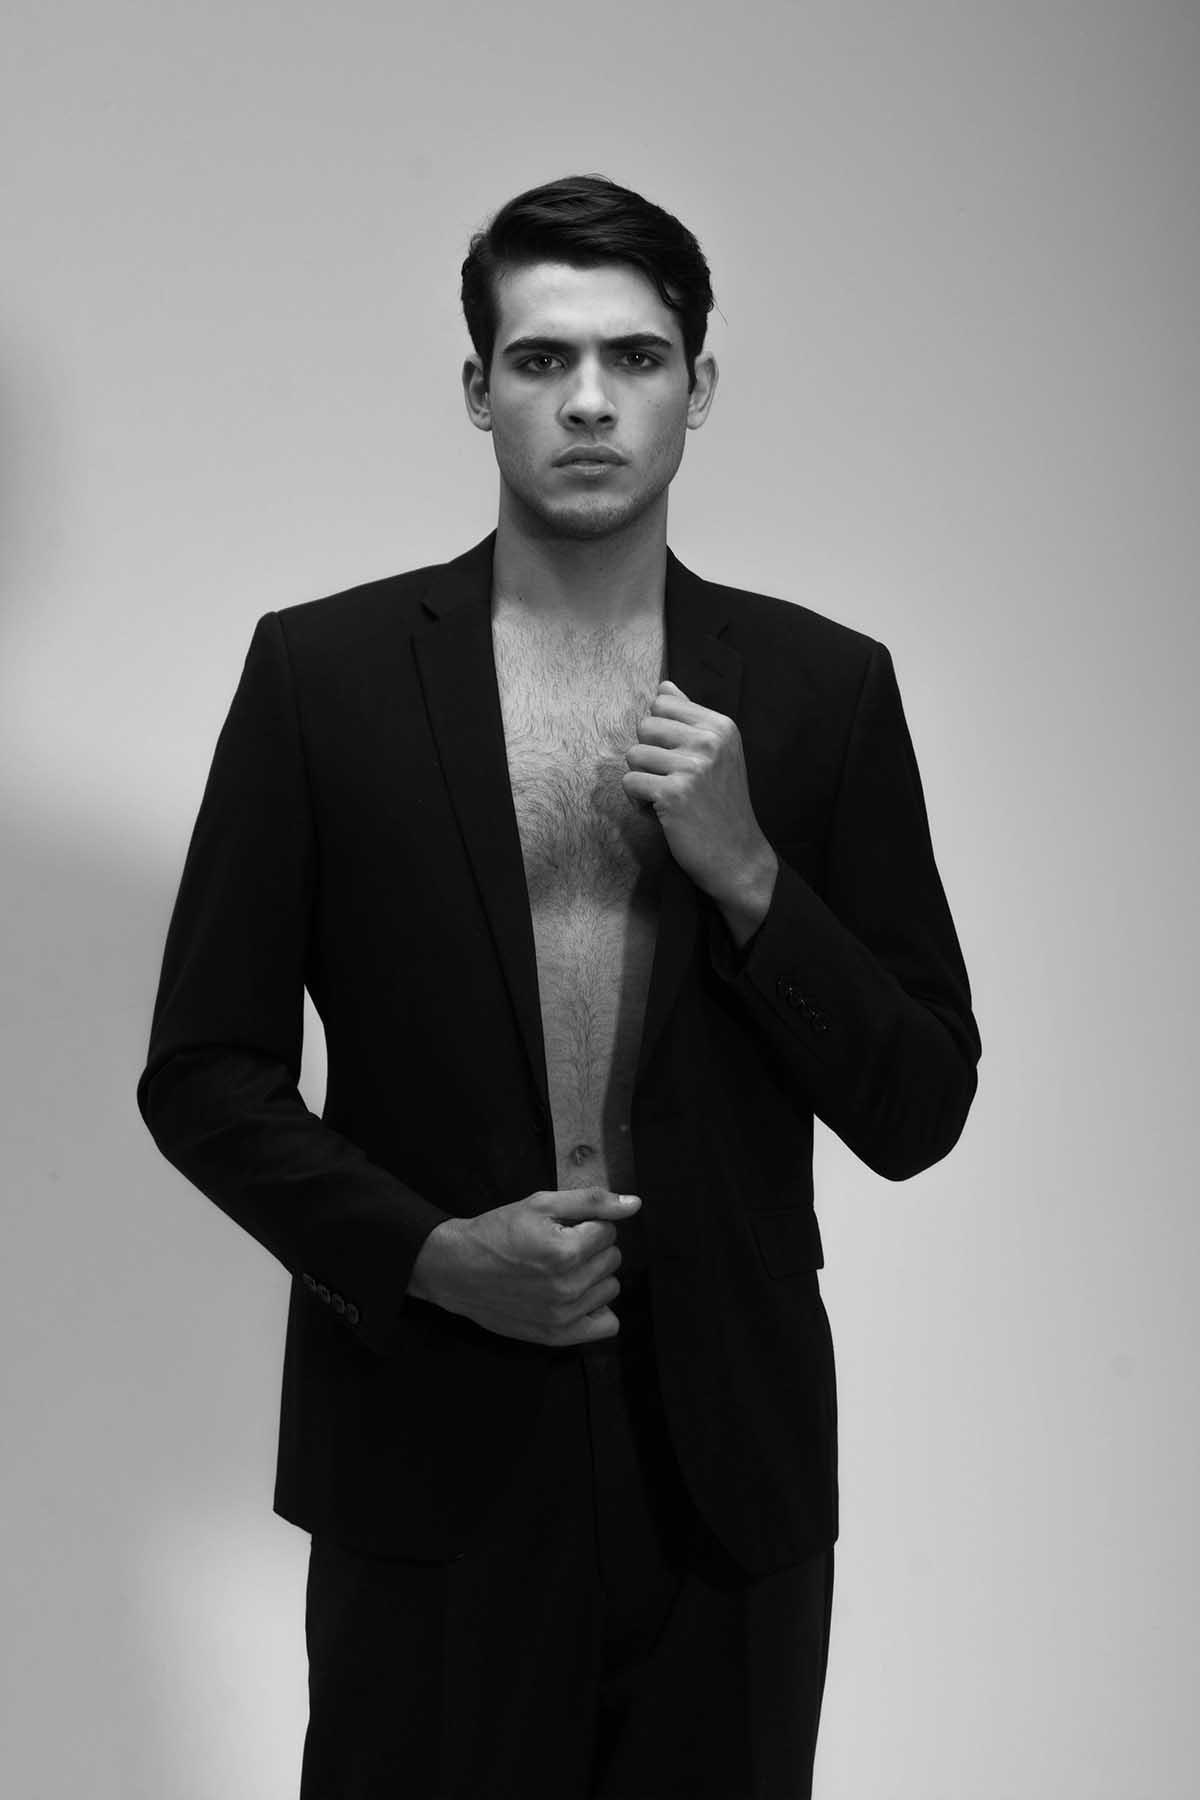 Gustavo Grellet by Nanda Tavares for Brazilian Male Model